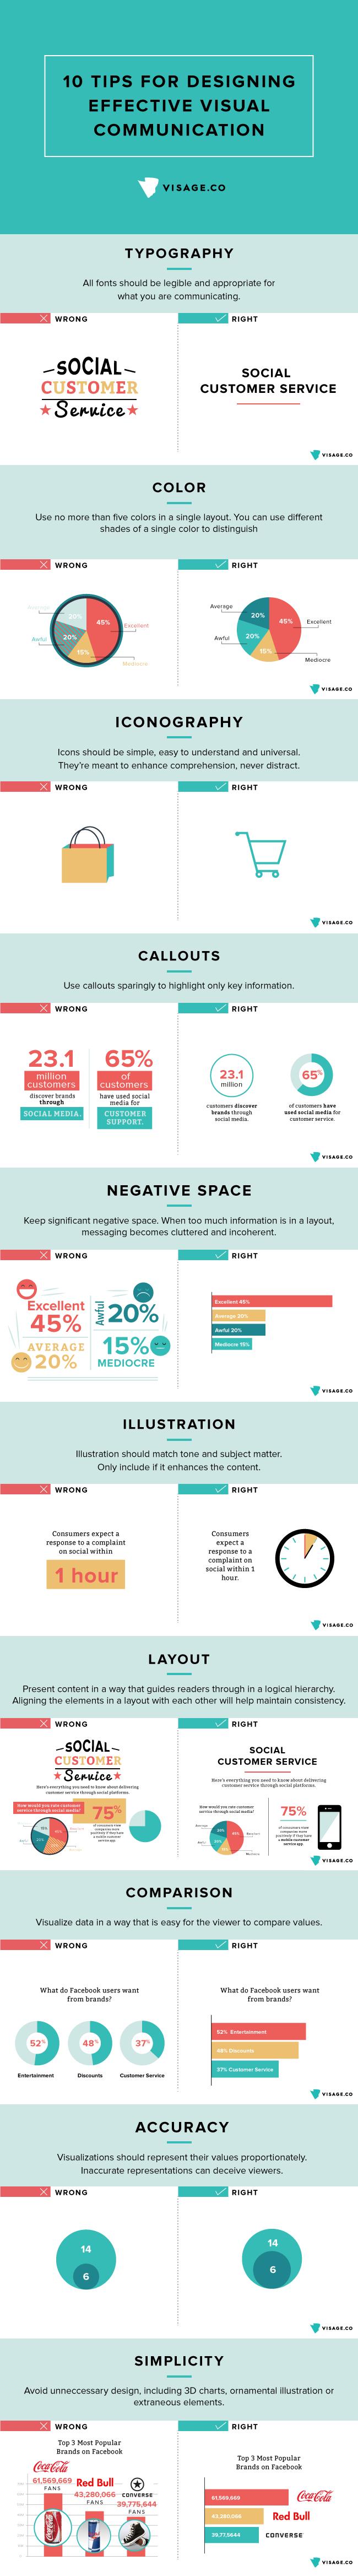 Designing Effective Visual Communication Infographic